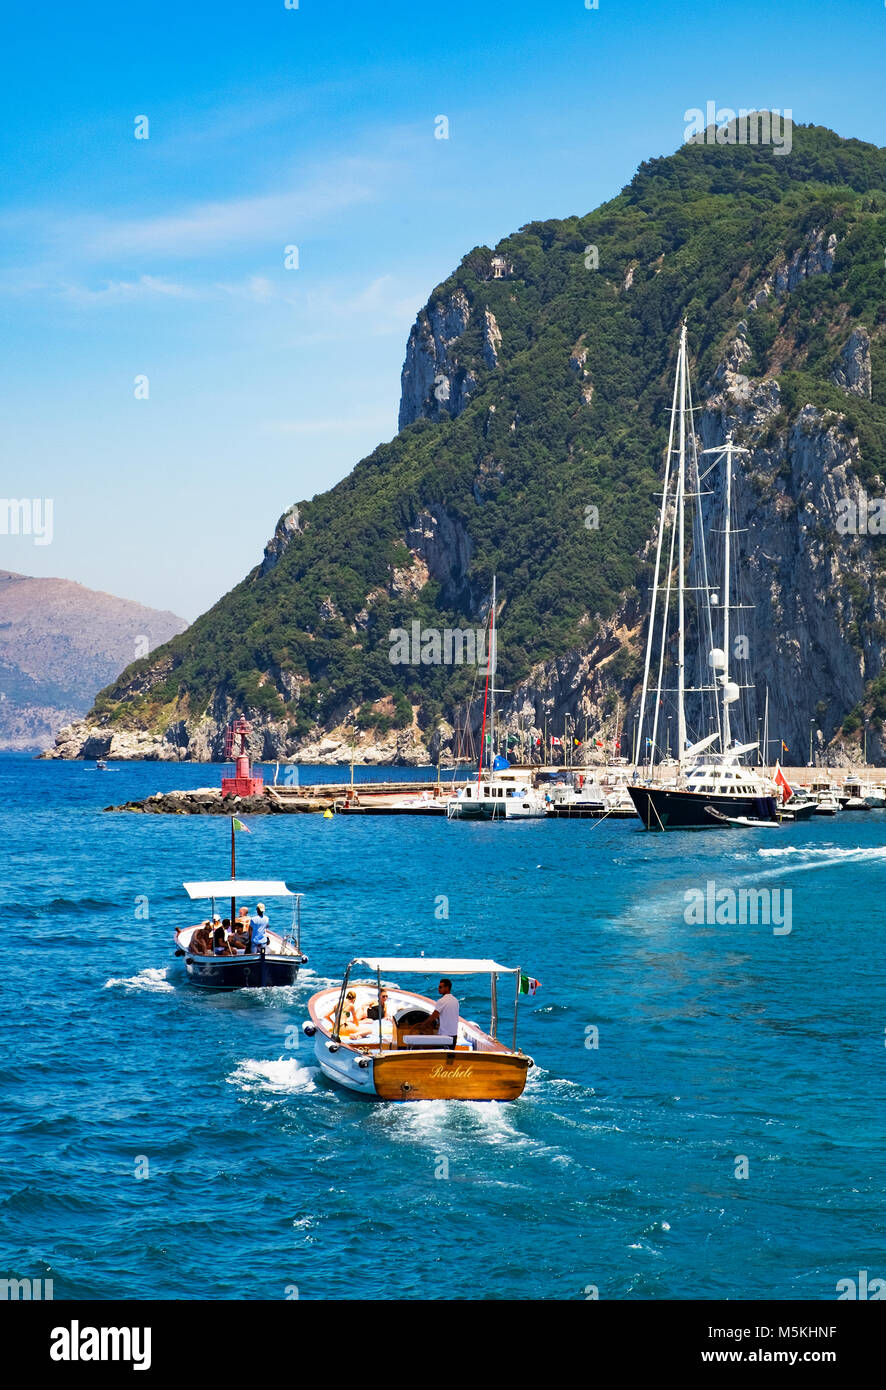 sailing around the island of capri, italy. - Stock Image